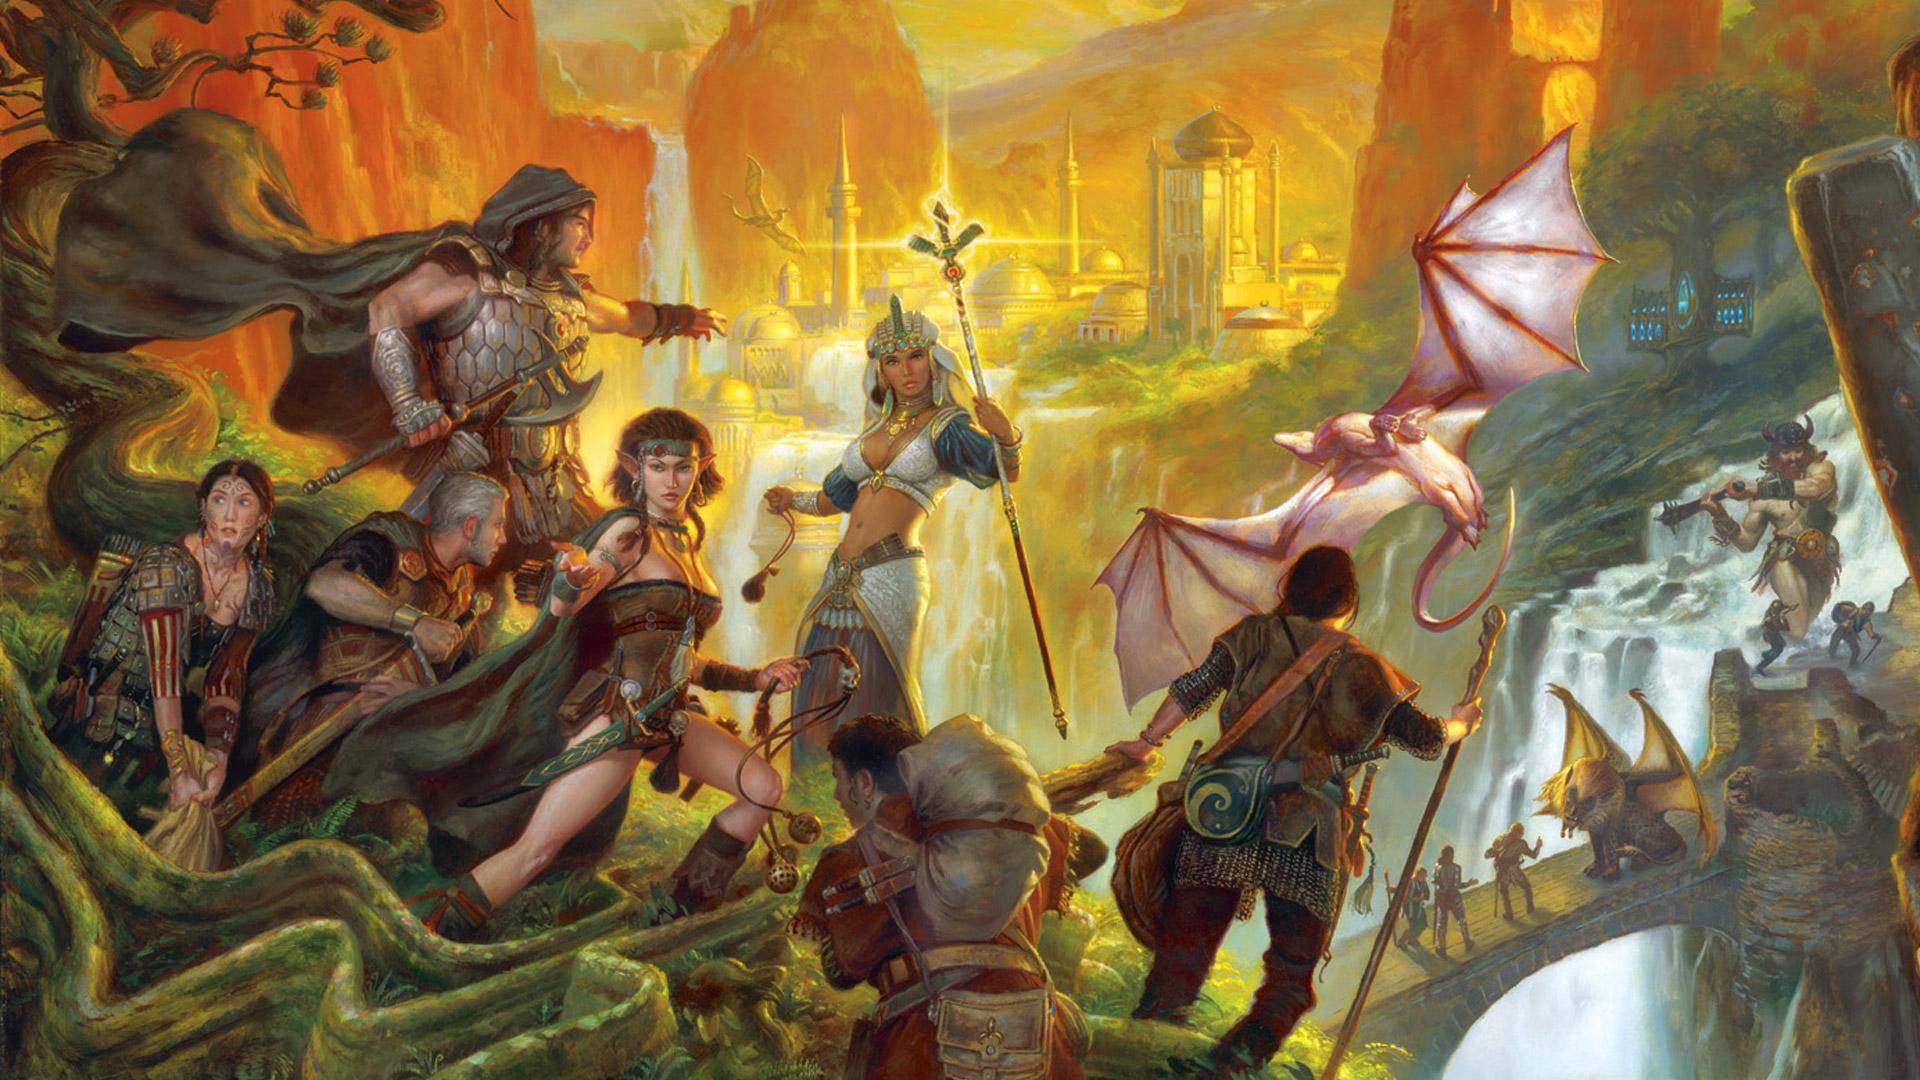 Free Vanguard: Saga of Heroes Wallpaper in 1920x1080